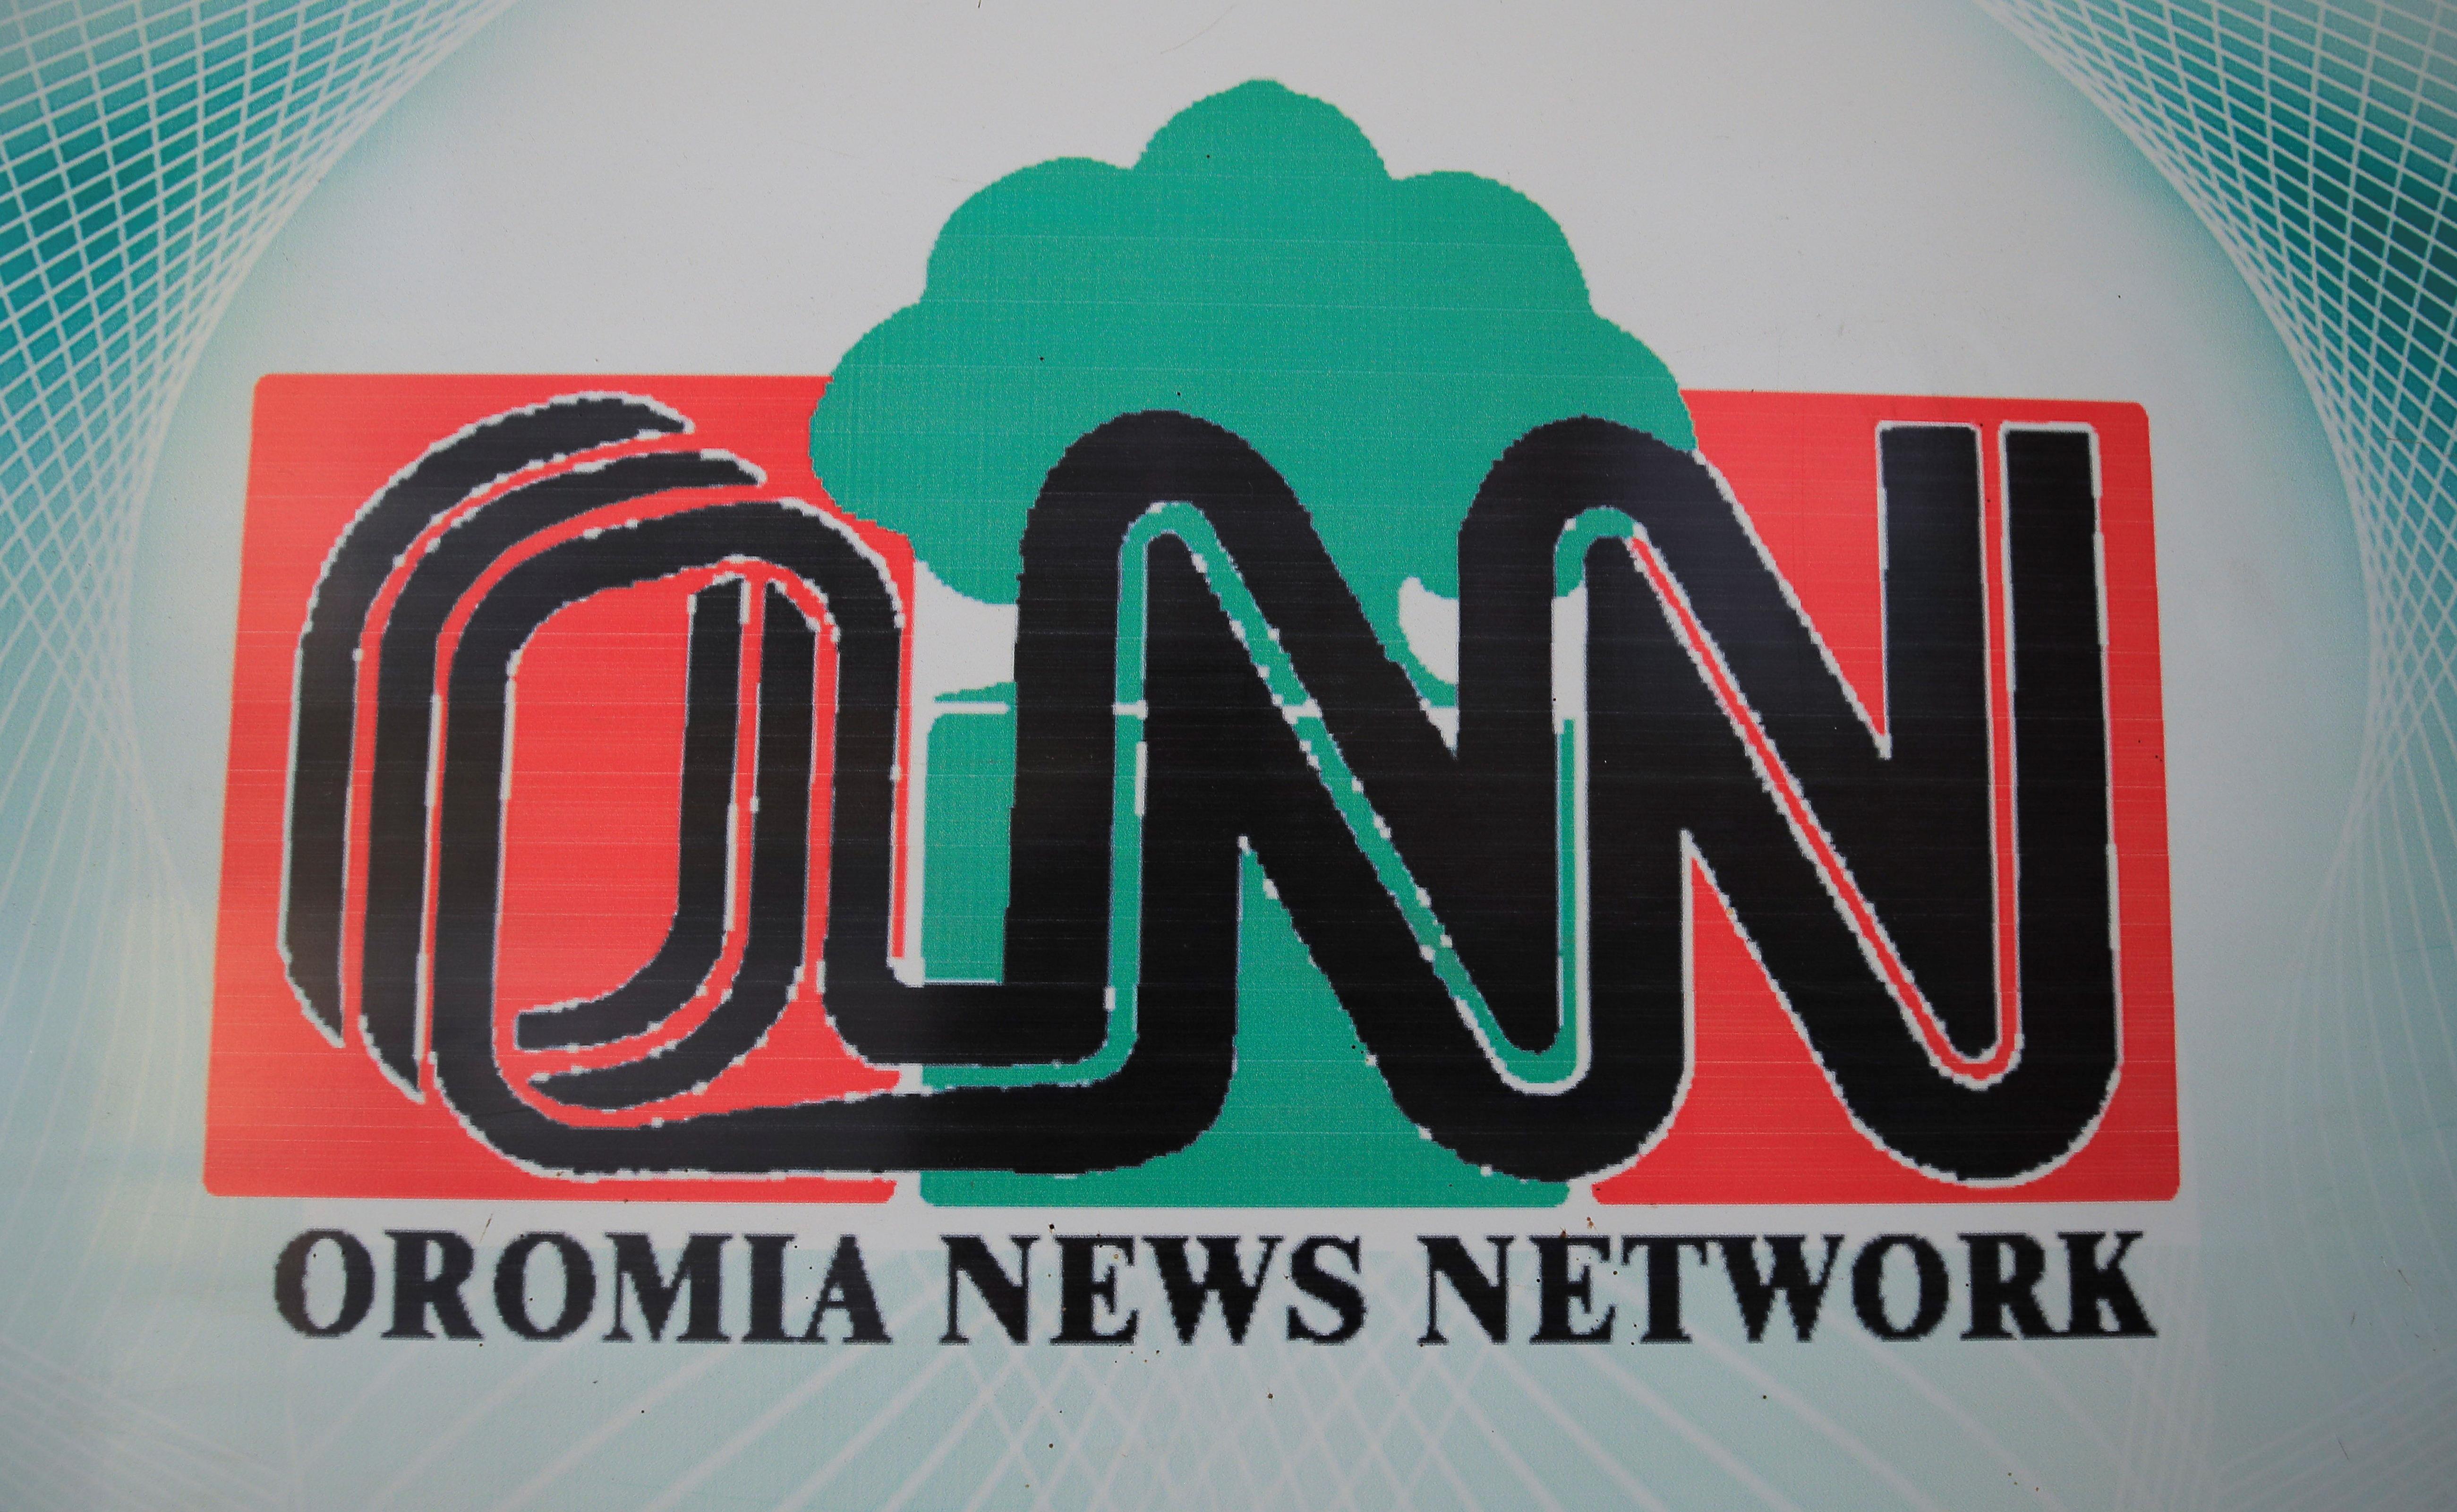 In Abiy's Ethiopia, press freedom flourished then fear returned